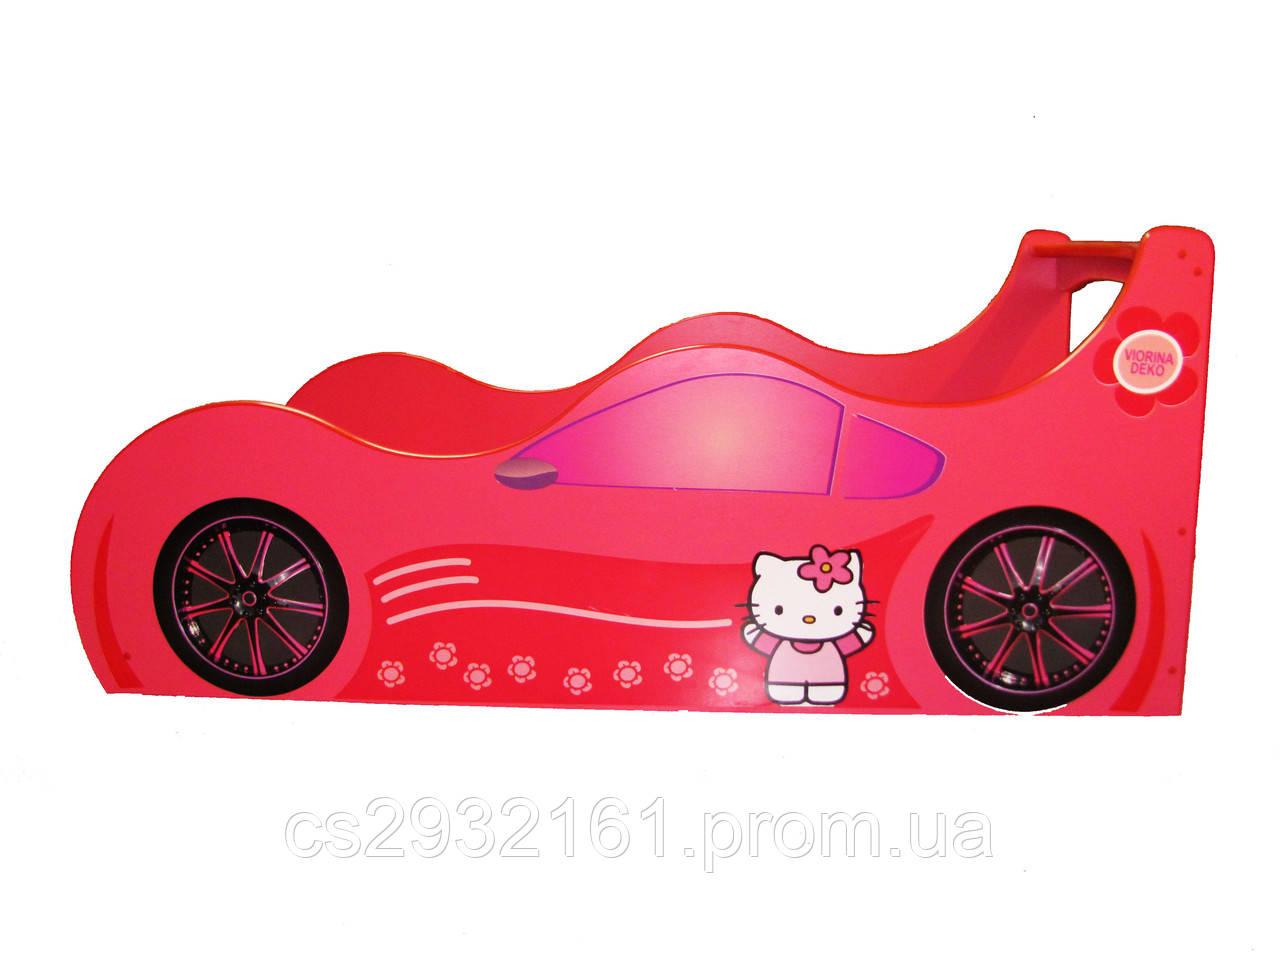 Кровать машина Hello kitty Детская кровать машина Хелло Китти Серия Forsage